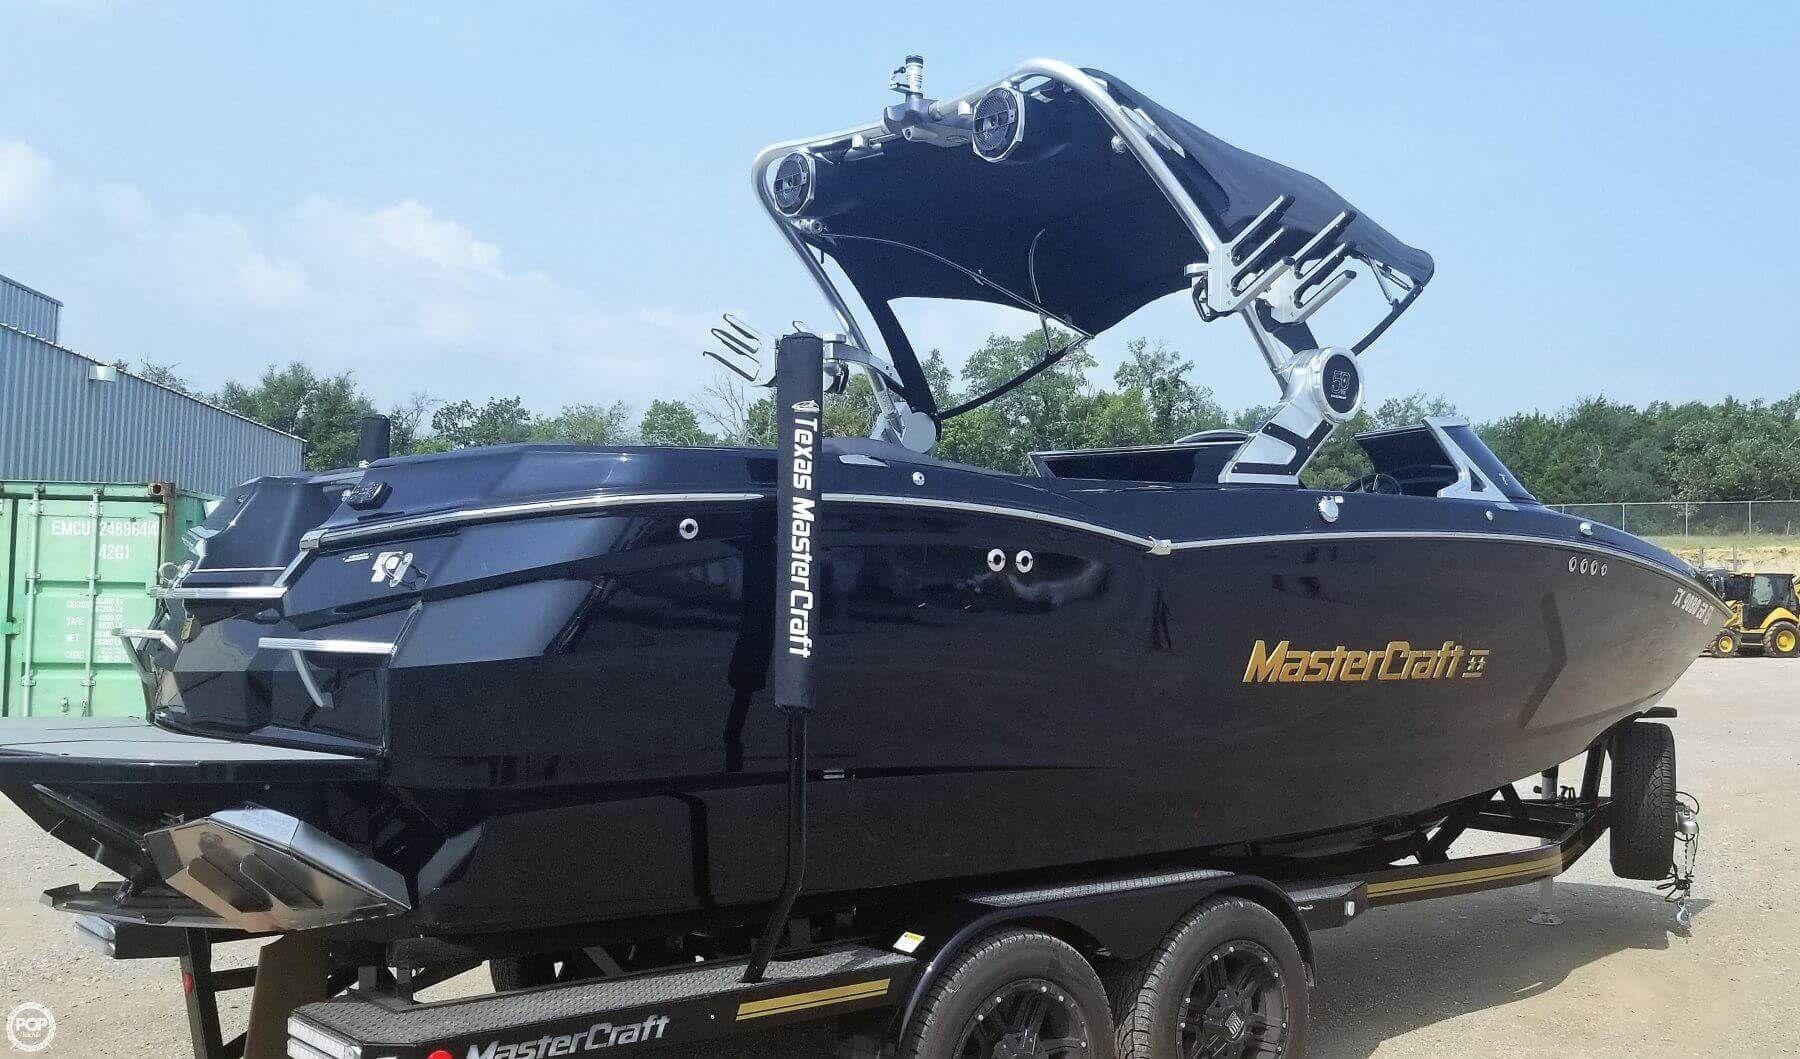 2018 Mastercraft Xstar For Sale Mastercraft Boat Mastercraft Xstar Mastercraft